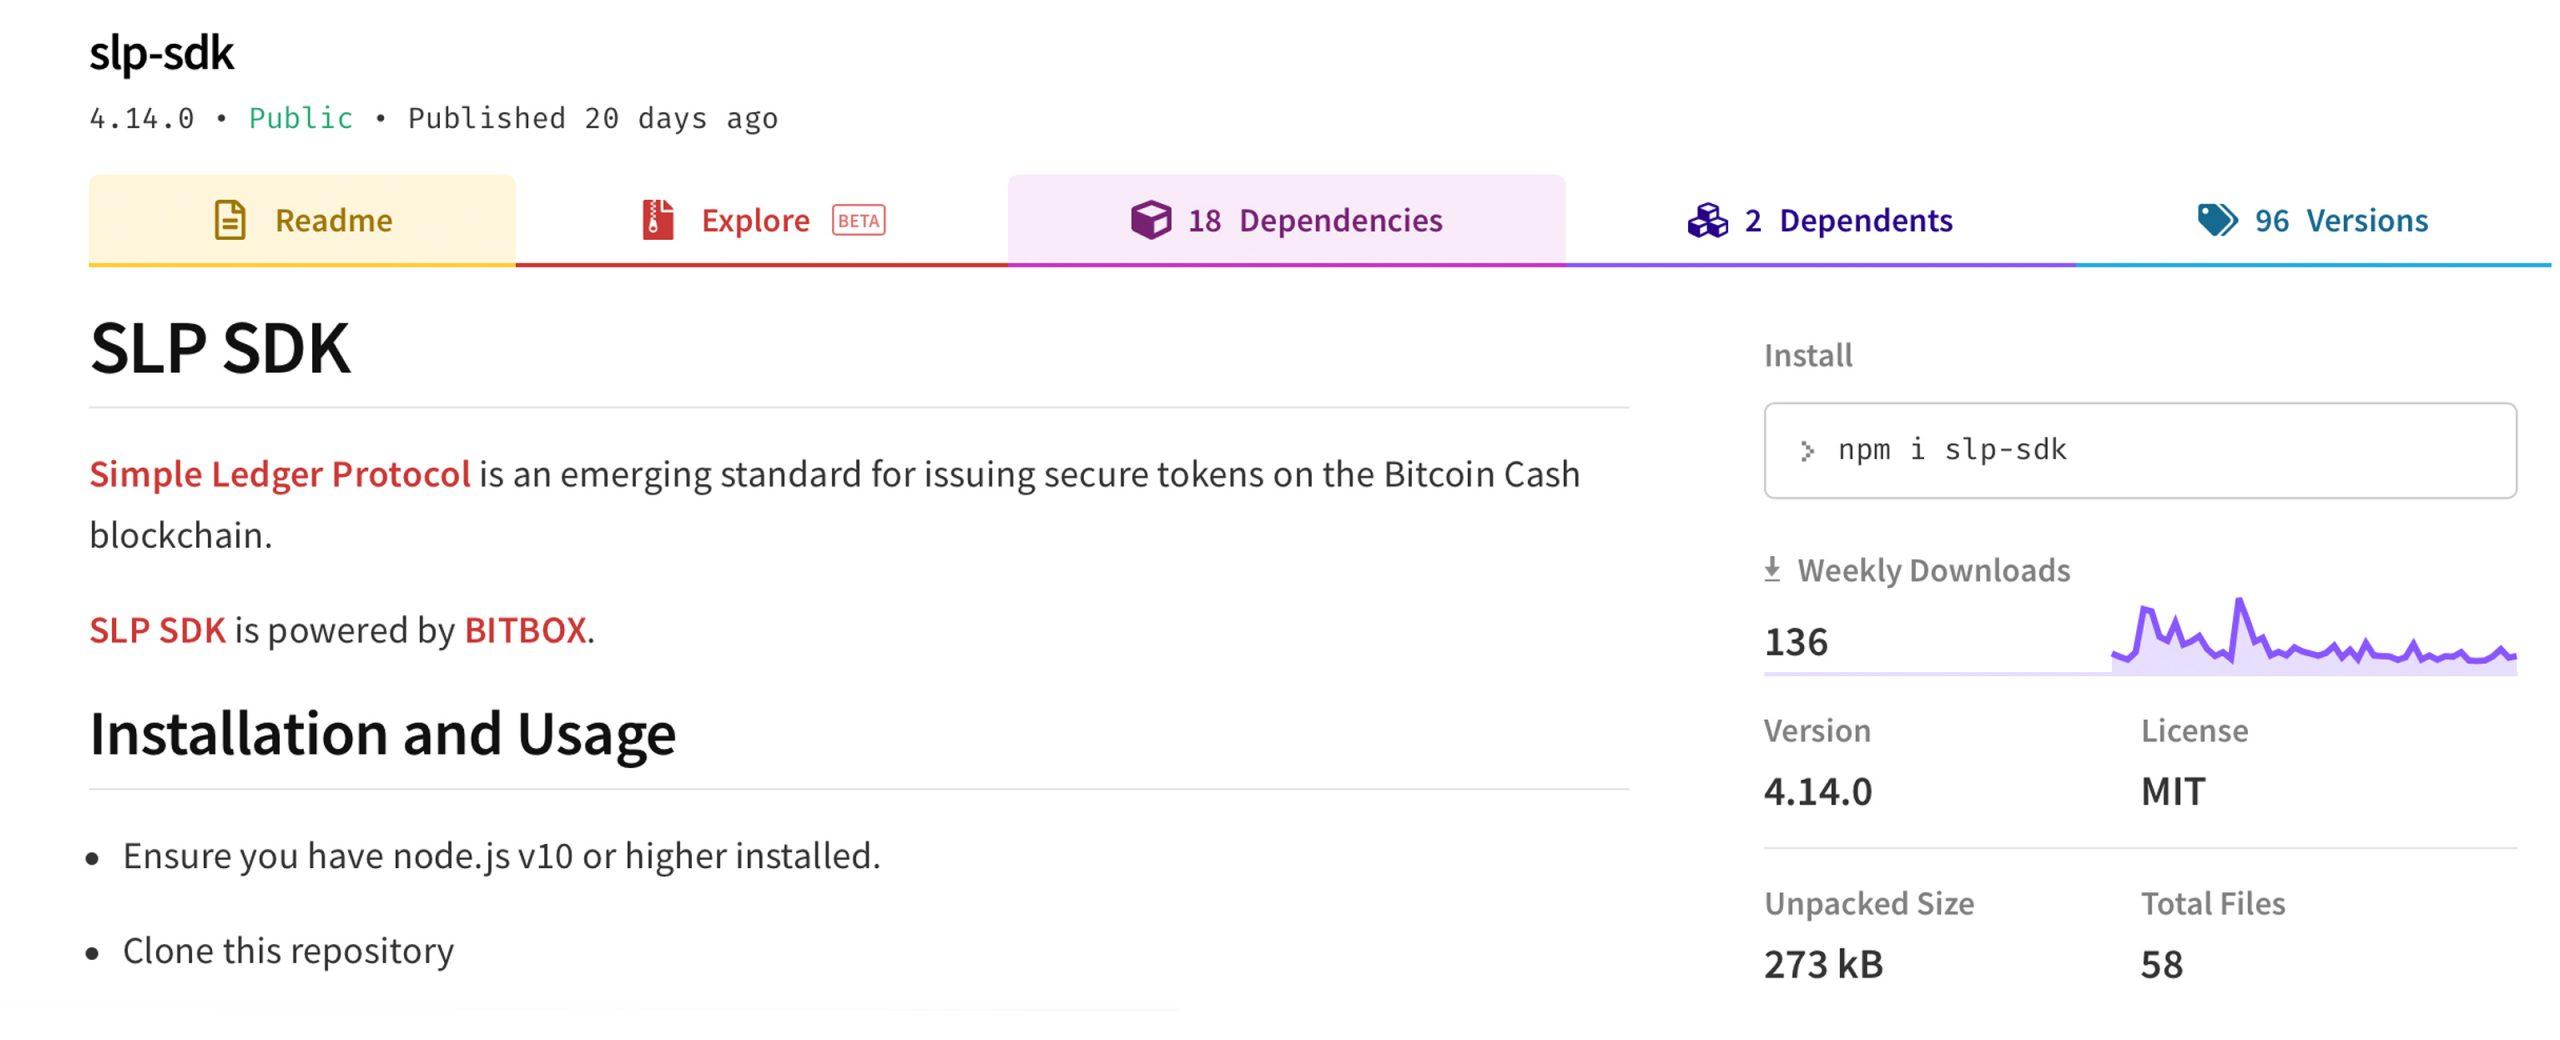 "Los desarrolladores de SLP publican recompensas de código con $ 2,500 + en Crypto Rewards ""ancho ="" 2560 ""altura = ""1040"" srcset = ""https://blackswanfinances.com/wp-content/uploads/2020/01/sdkyup-scaled.jpg 2560w, https://news.bitcoin.com/wp-content/uploads/ 2020/01 / sdkyup-300x122.jpg 300w, https://news.bitcoin.com/wp-content/uploads/2020/01/sdkyup-1024x416.jpg 1024w, https://news.bitcoin.com/wp- content / uploads / 2020/01 / sdkyup-768x312.jpg 768w, https://news.bitcoin.com/wp-content/uploads/2020/01/sdkyup-1536x624.jpg 1536w, https: //news.bitcoin. com / wp-content / uploads / 2020/01 / sdkyup-2048x832.jpg 2048w, https://news.bitcoin.com/wp-content/uploads/2020/01/sdkyup-696x283.jpg 696w, https: // news.bitcoin.com/wp-content/uploads/2020/01/sdkyup-1392x566.jpg 1392w, https://news.bitcoin.com/wp-content/uploads/2020/01/sdkyup-1068x434.jpg 1068w, https://news.bitcoin.com/w p-content / uploads / 2020/01 / sdkyup-1034x420.jpg 1034w, https://news.bitcoin.com/wp-content/uploads/2020/01/sdkyup-1920x780.jpg 1920w ""tamaños ="" (max- ancho: 2560px) 100vw, 2560px"